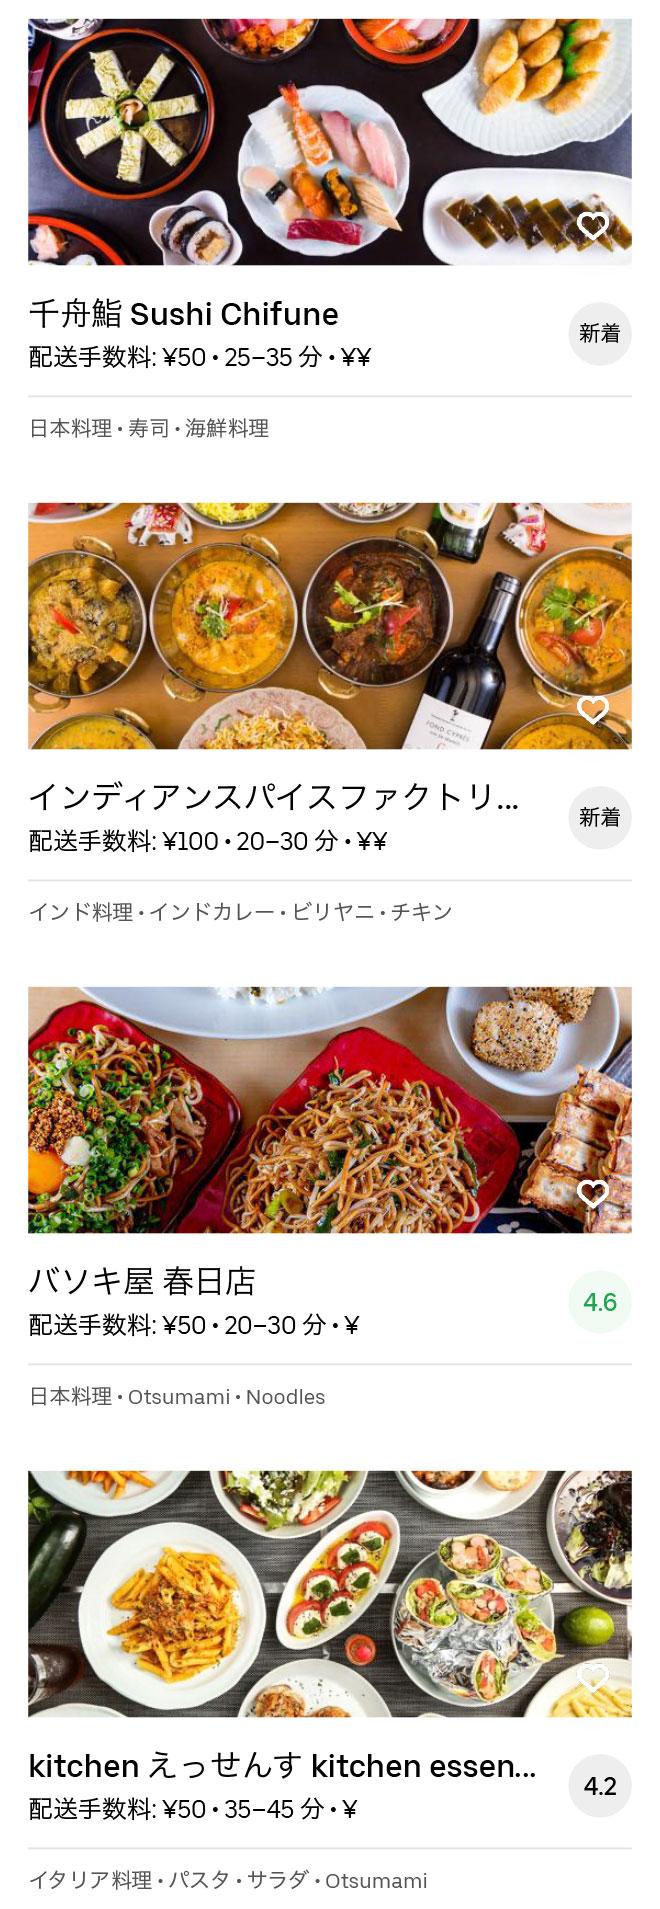 Kasuga hakataminami menu 2004 06